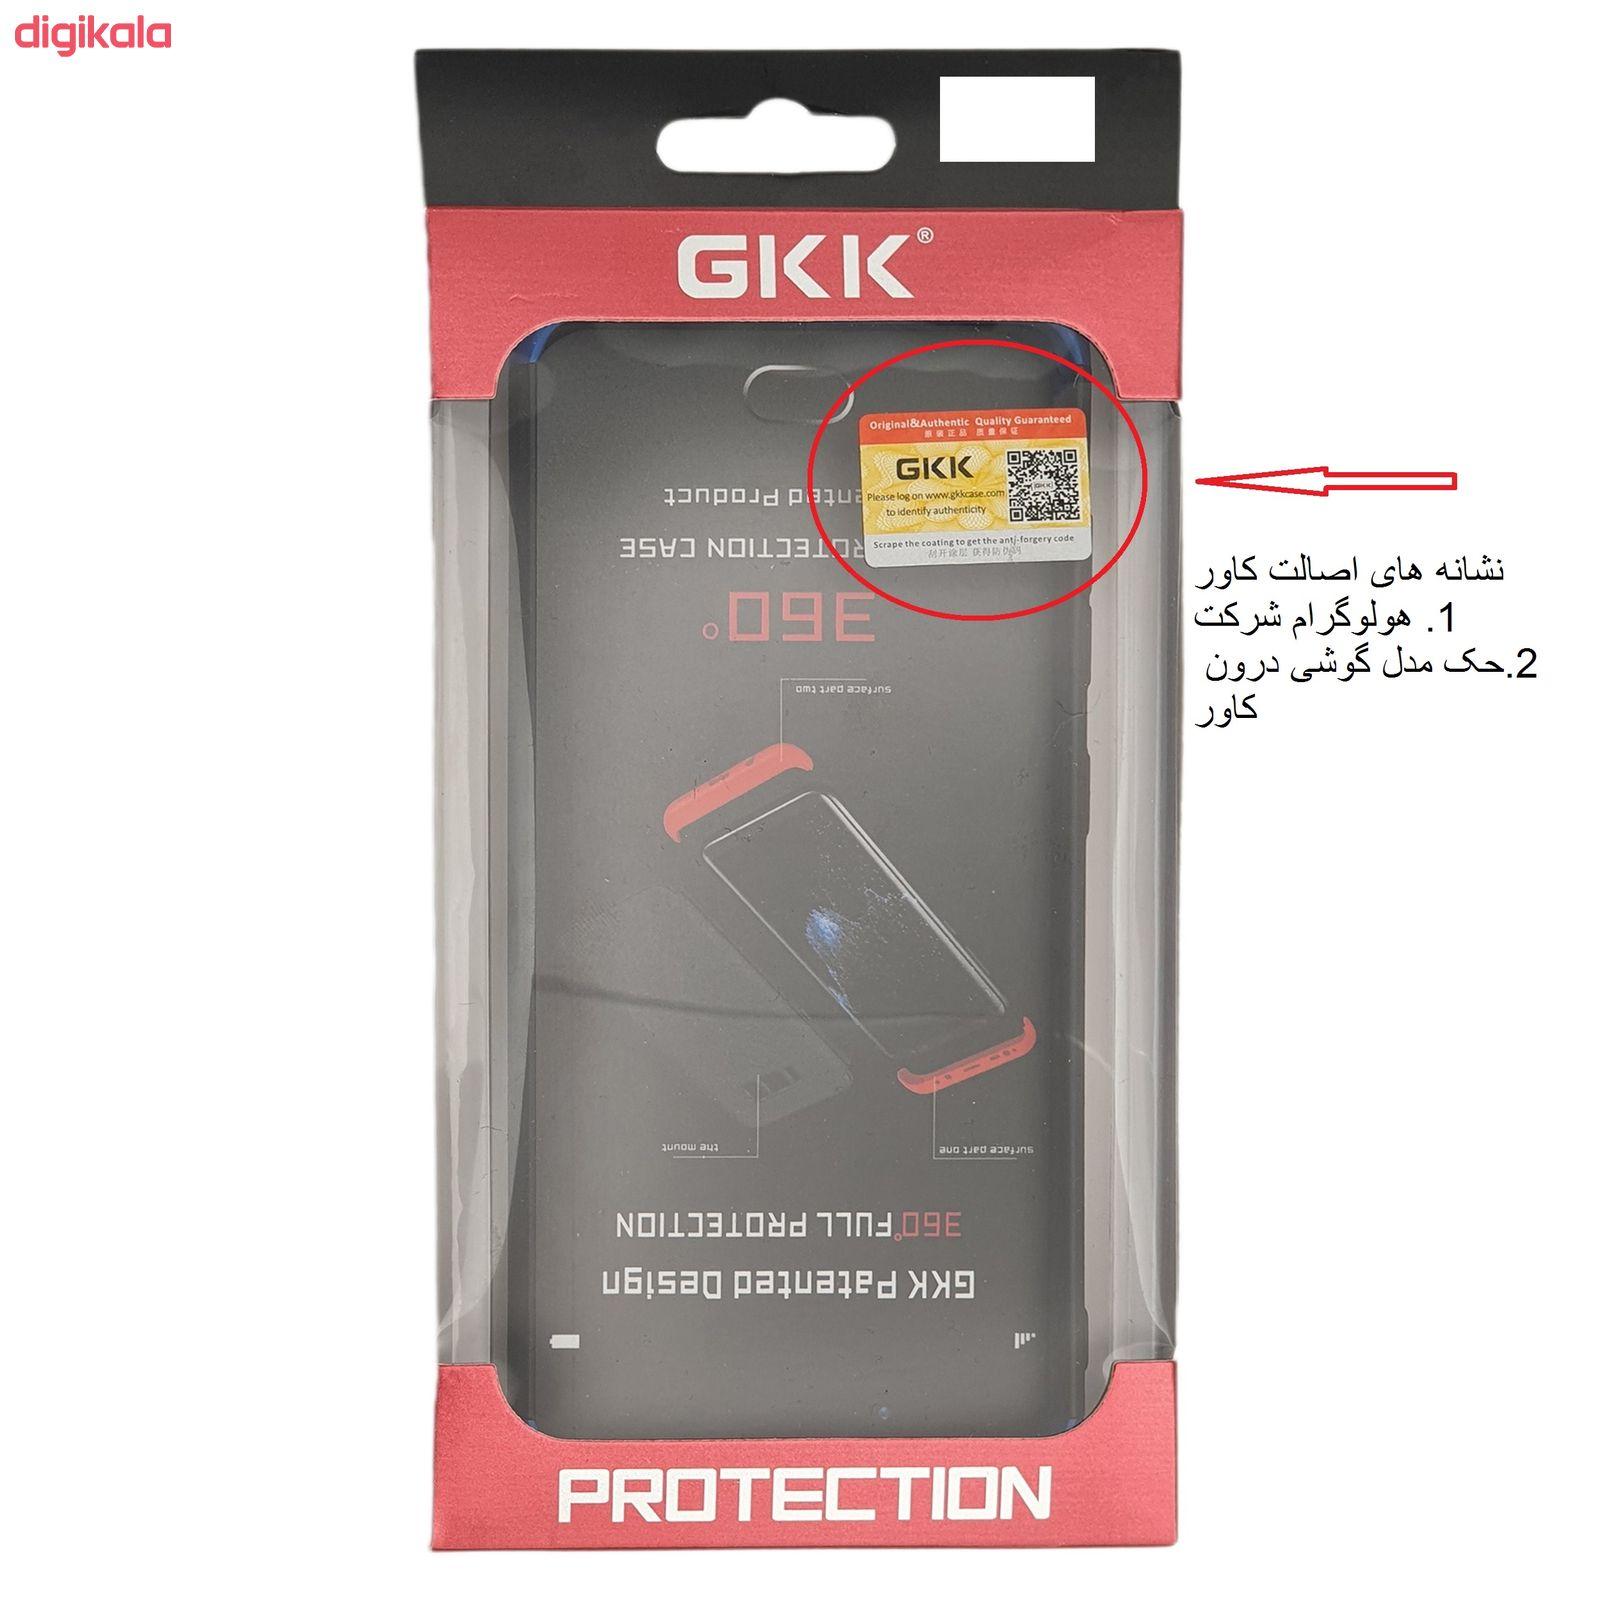 کاور 360 درجه جی کی کی مدل GK-A71-71 مناسب برای گوشی موبایل سامسونگ GALAXY A71 main 1 3